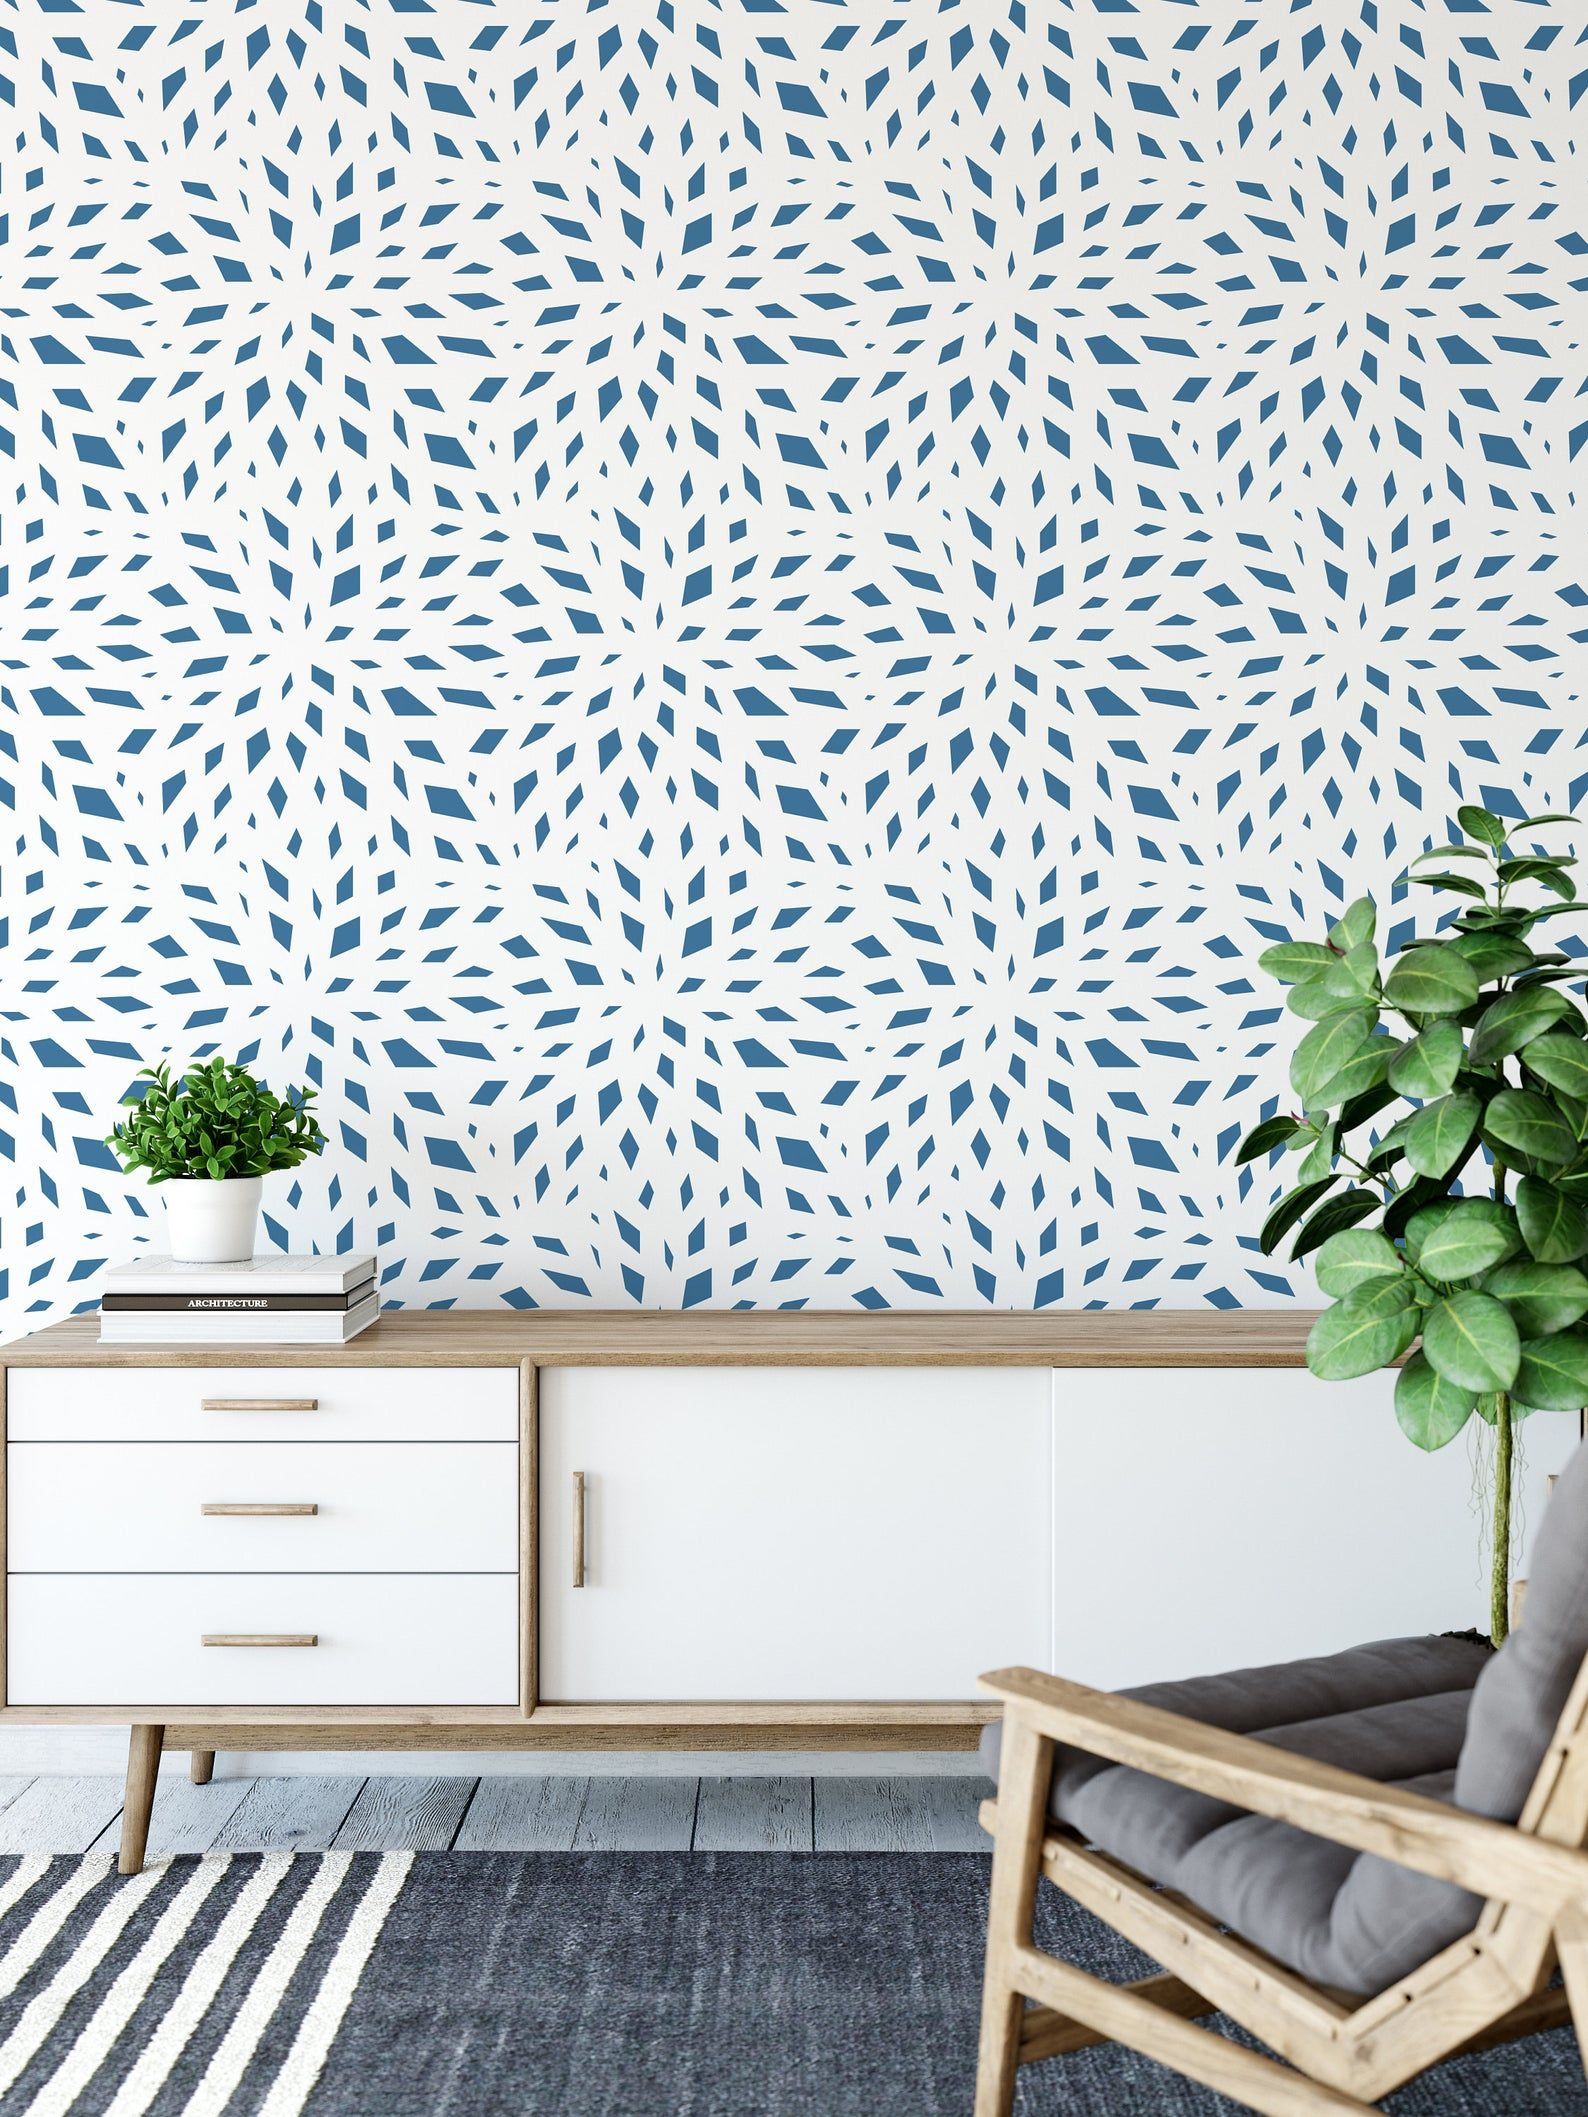 Natural Designer Wallpaper Removable And Self Adhesive Peel Etsy Designer Wallpaper Peel And Stick Wallpaper Wallpaper